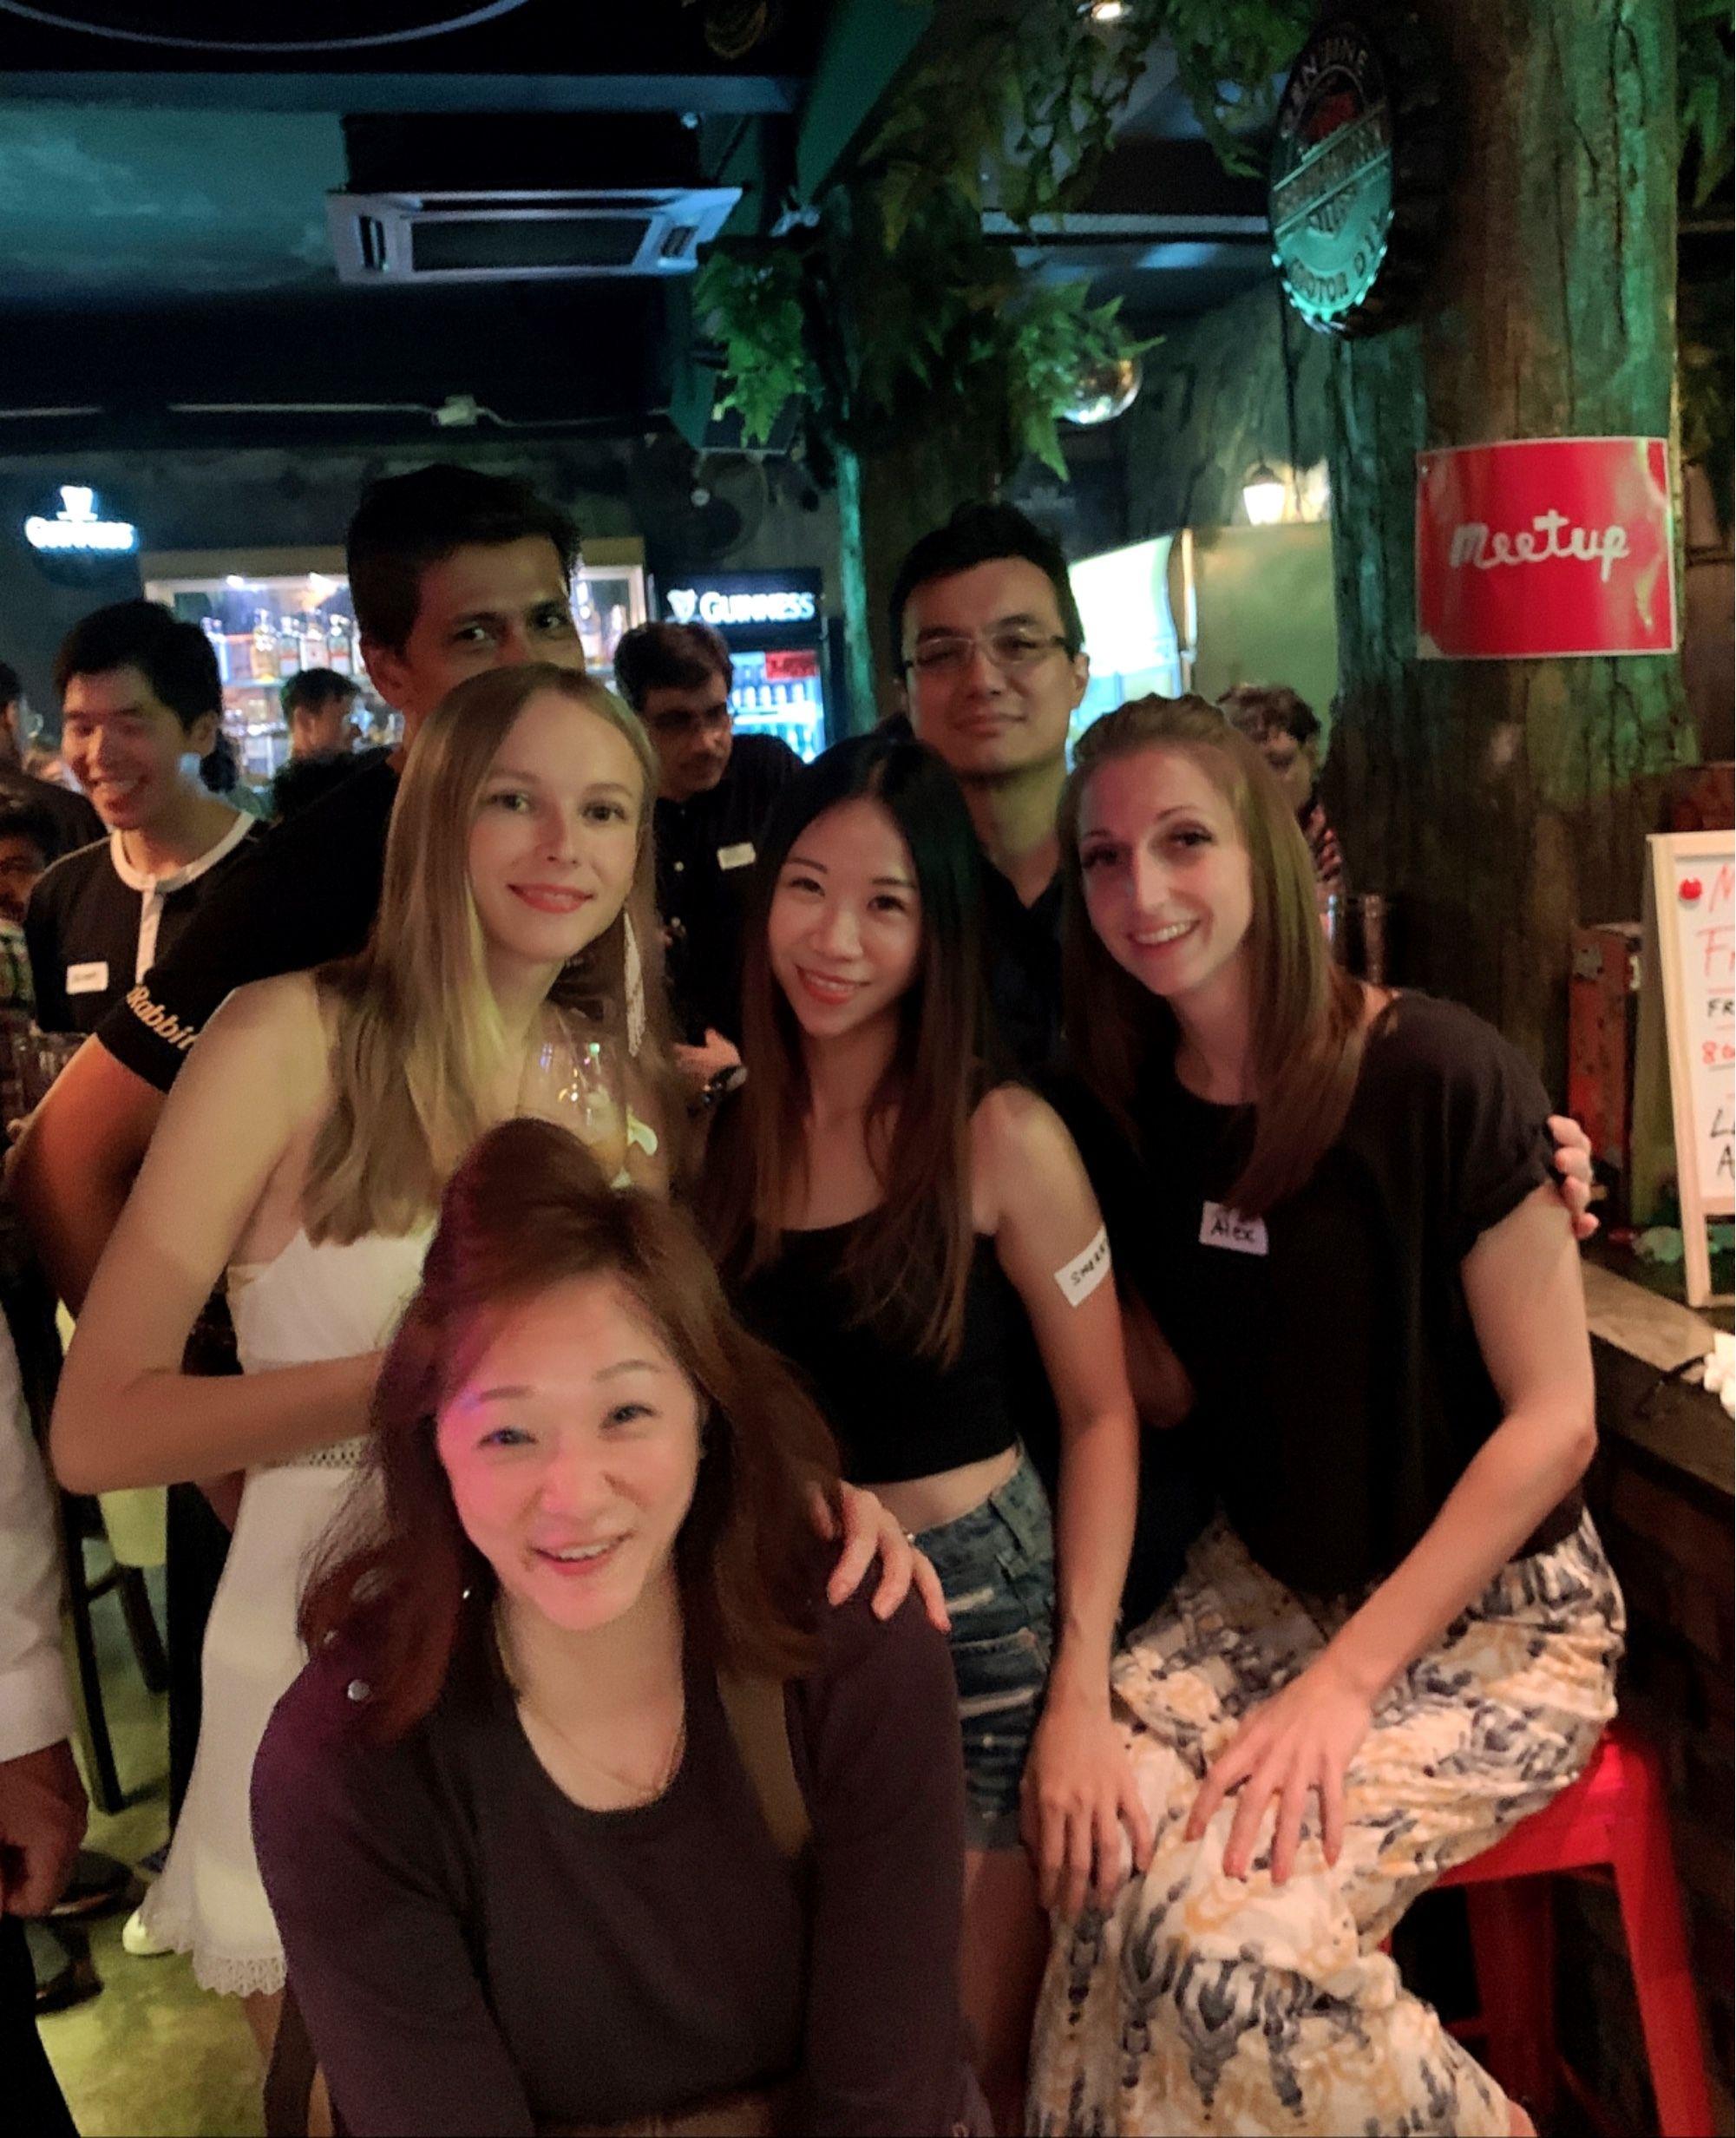 Meet New People KL